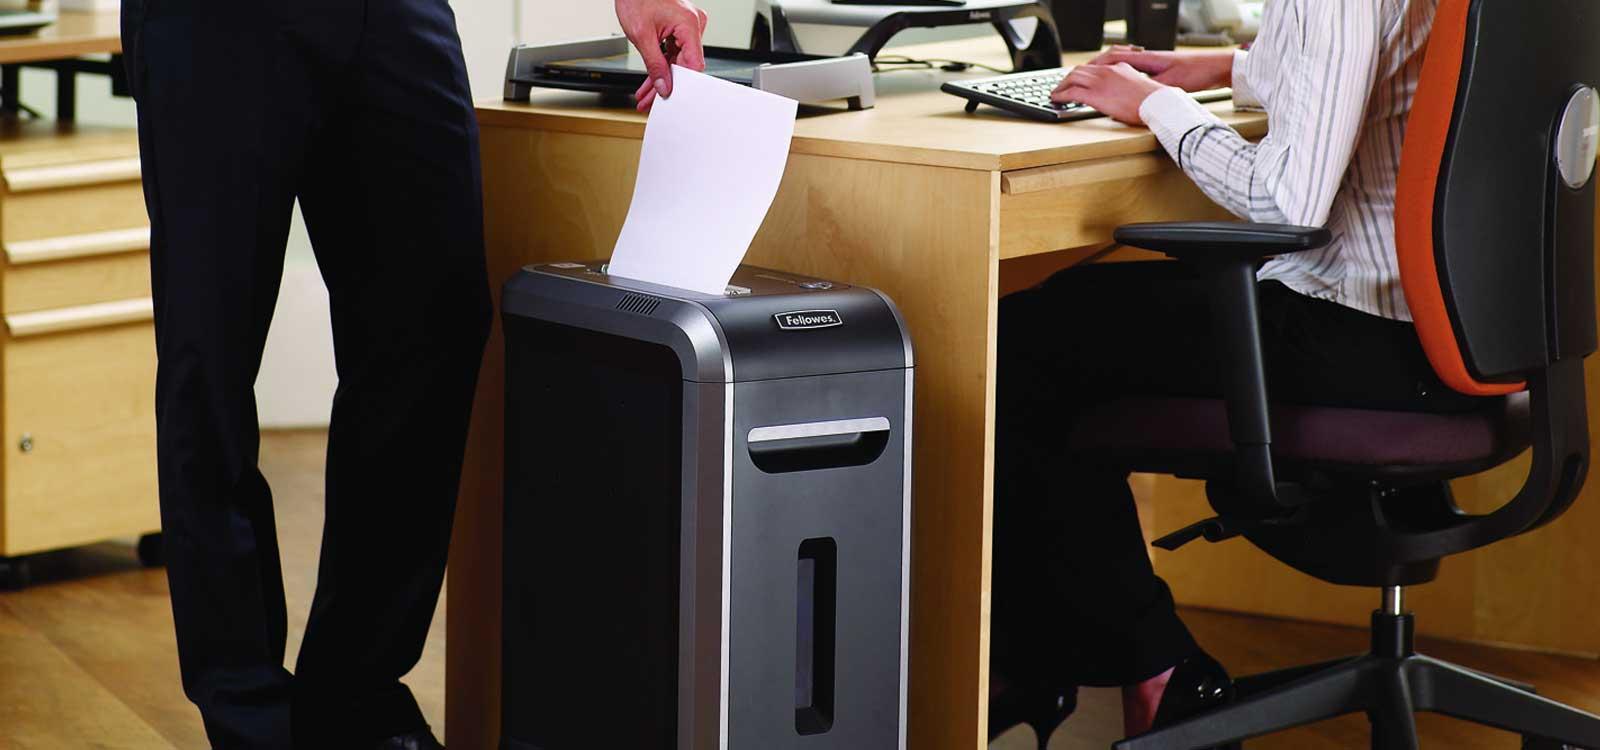 professionele-papierversnipperaar-klein-kantoor-header